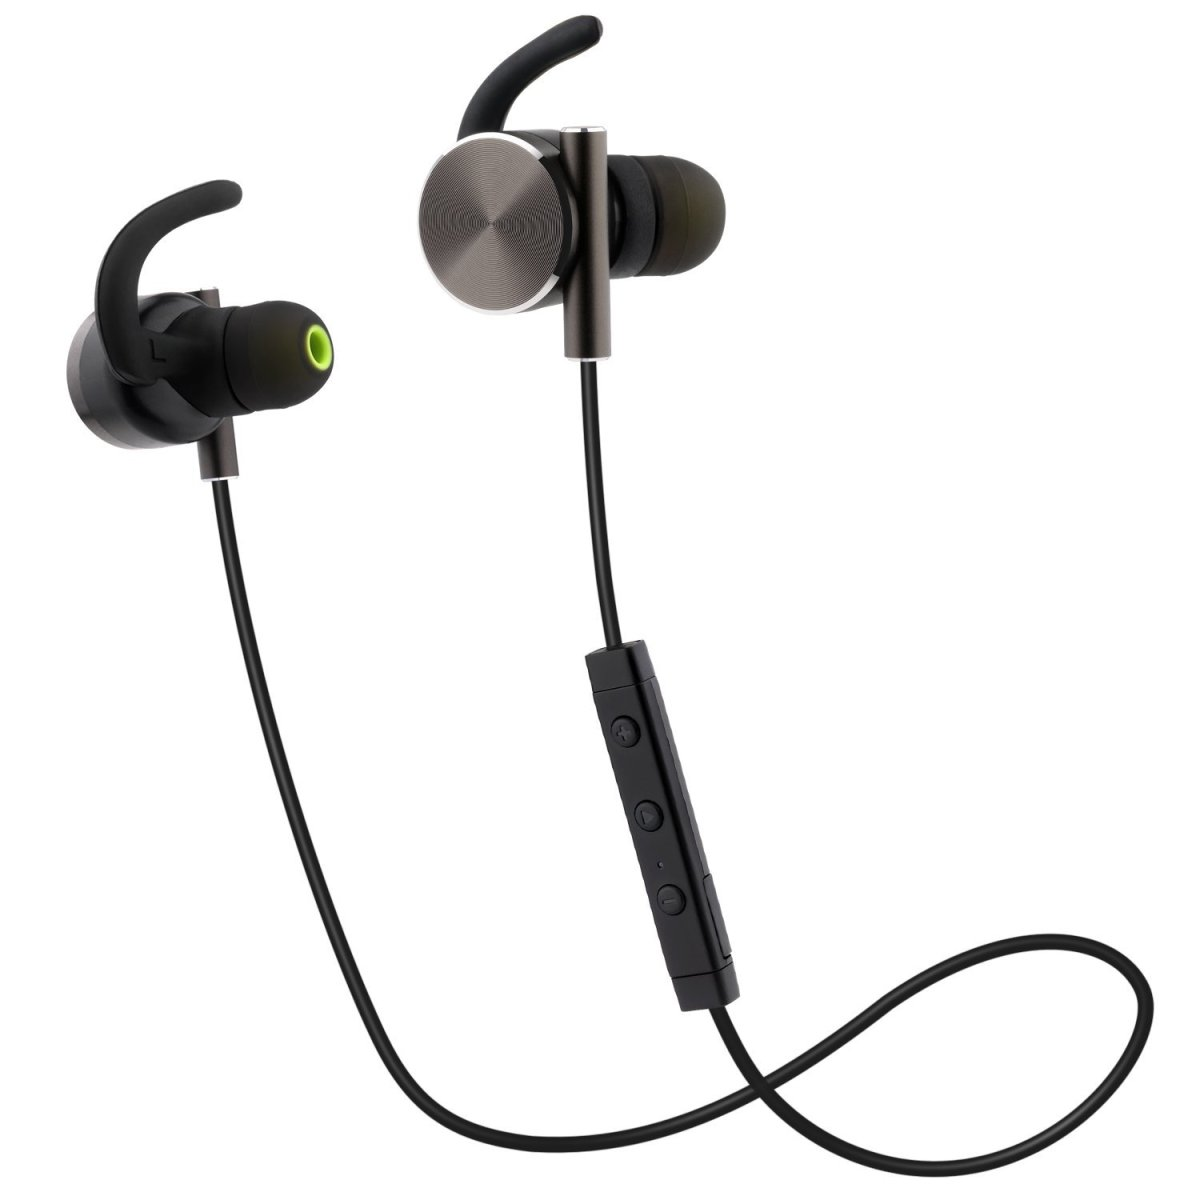 soundpeats headphones